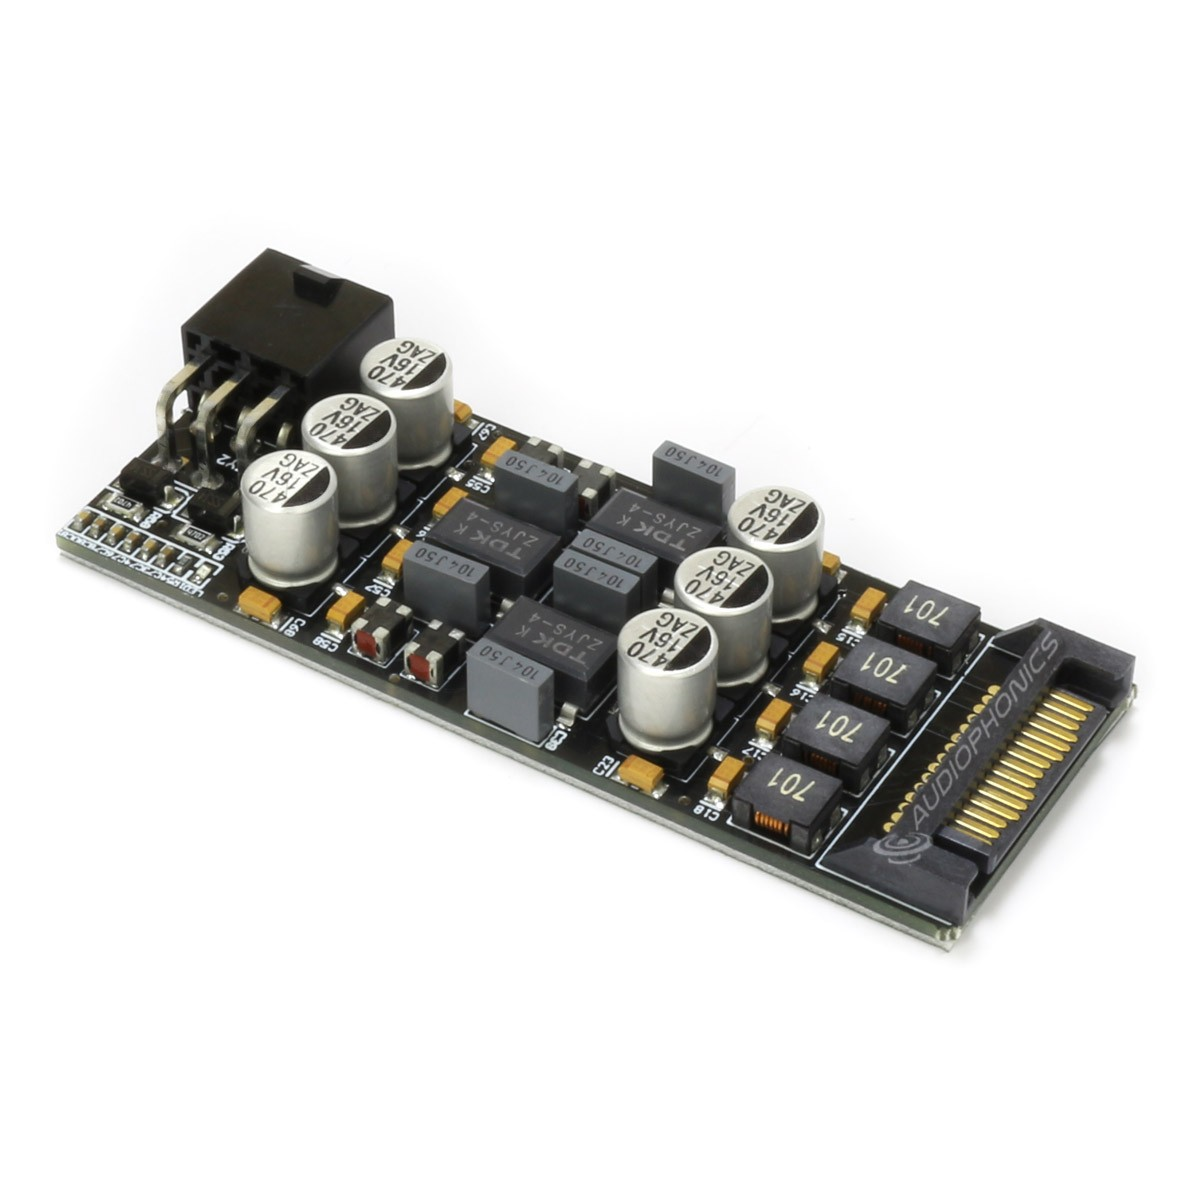 ELFIDELITY AXF-106 Molex / SATA Computer Power Filter